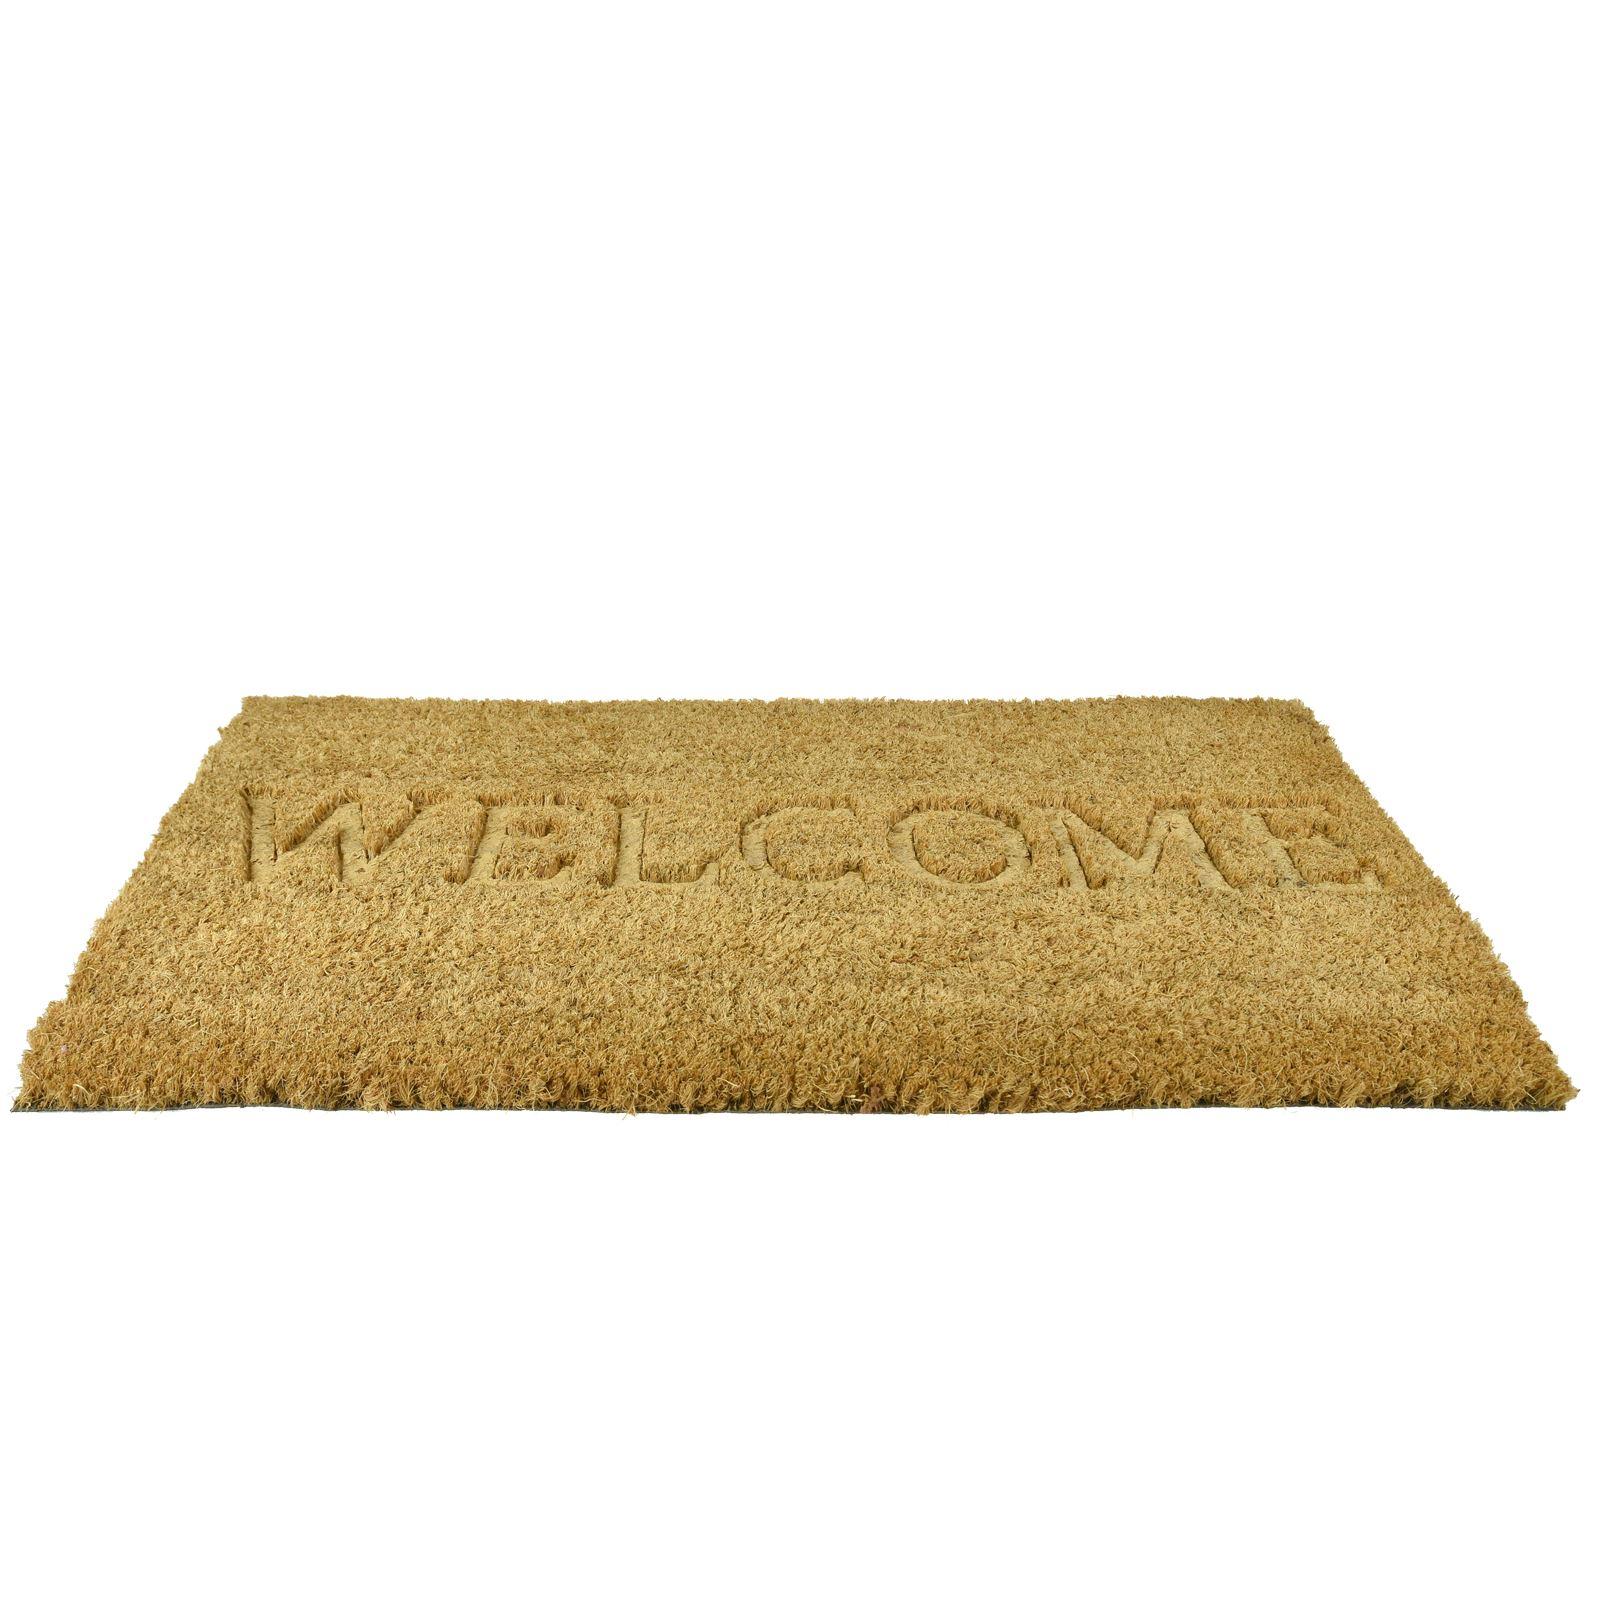 Plain-Non-Slip-Door-Mat-Tough-Natural-Coir-PVC-Back-Welcome-Doormat-40-x-60cm miniatura 42